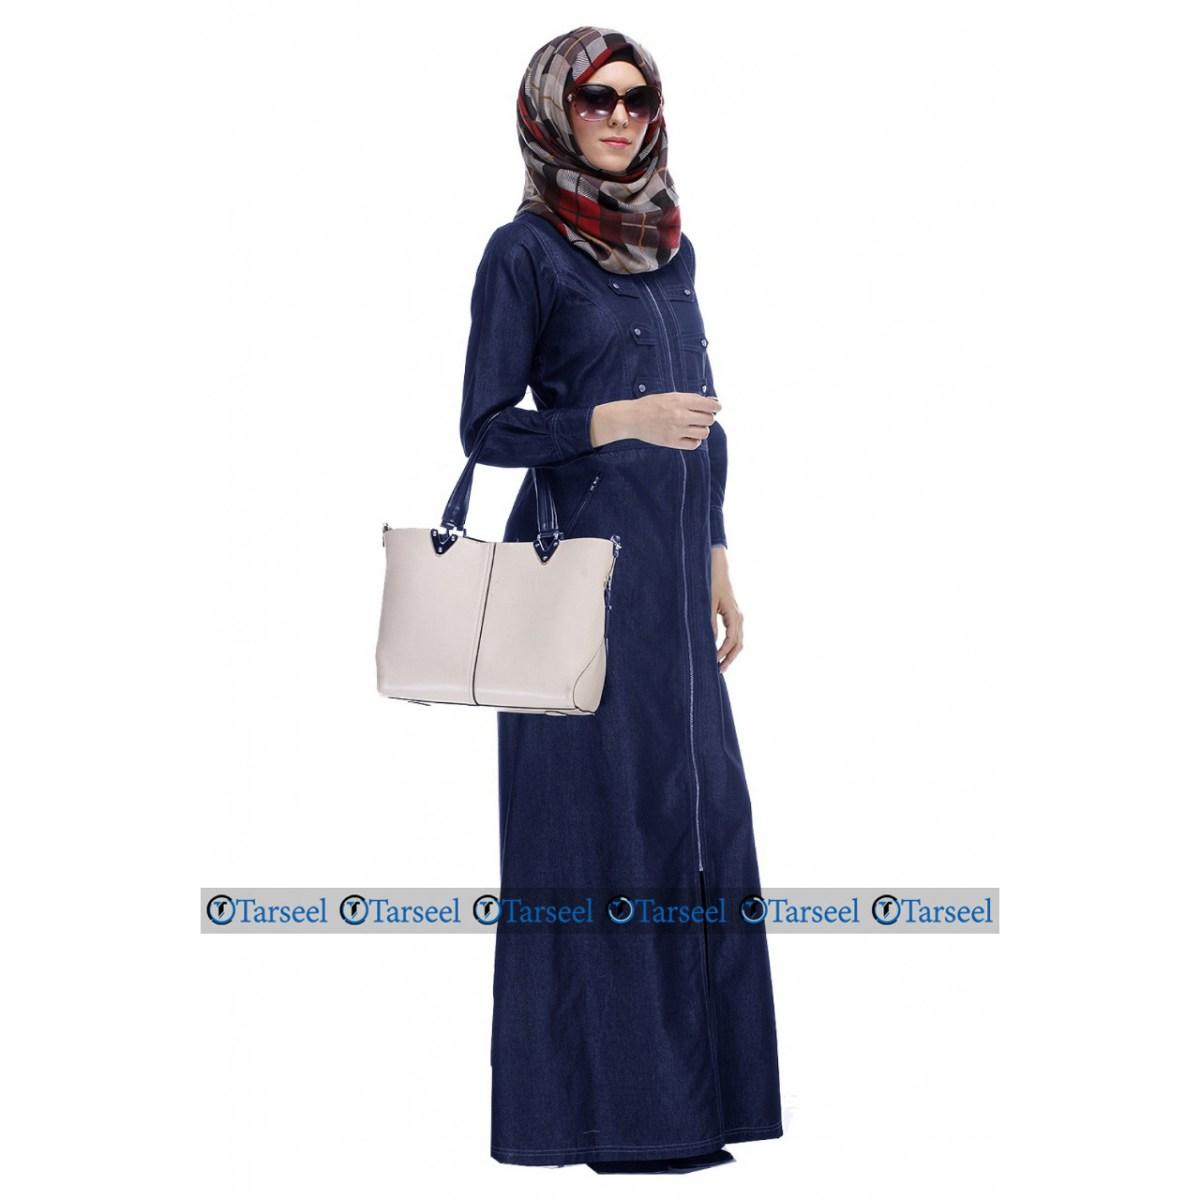 Buy-Front-Full-Zipper-Denim-Abaya-Fashion-Online-In-Pakistan